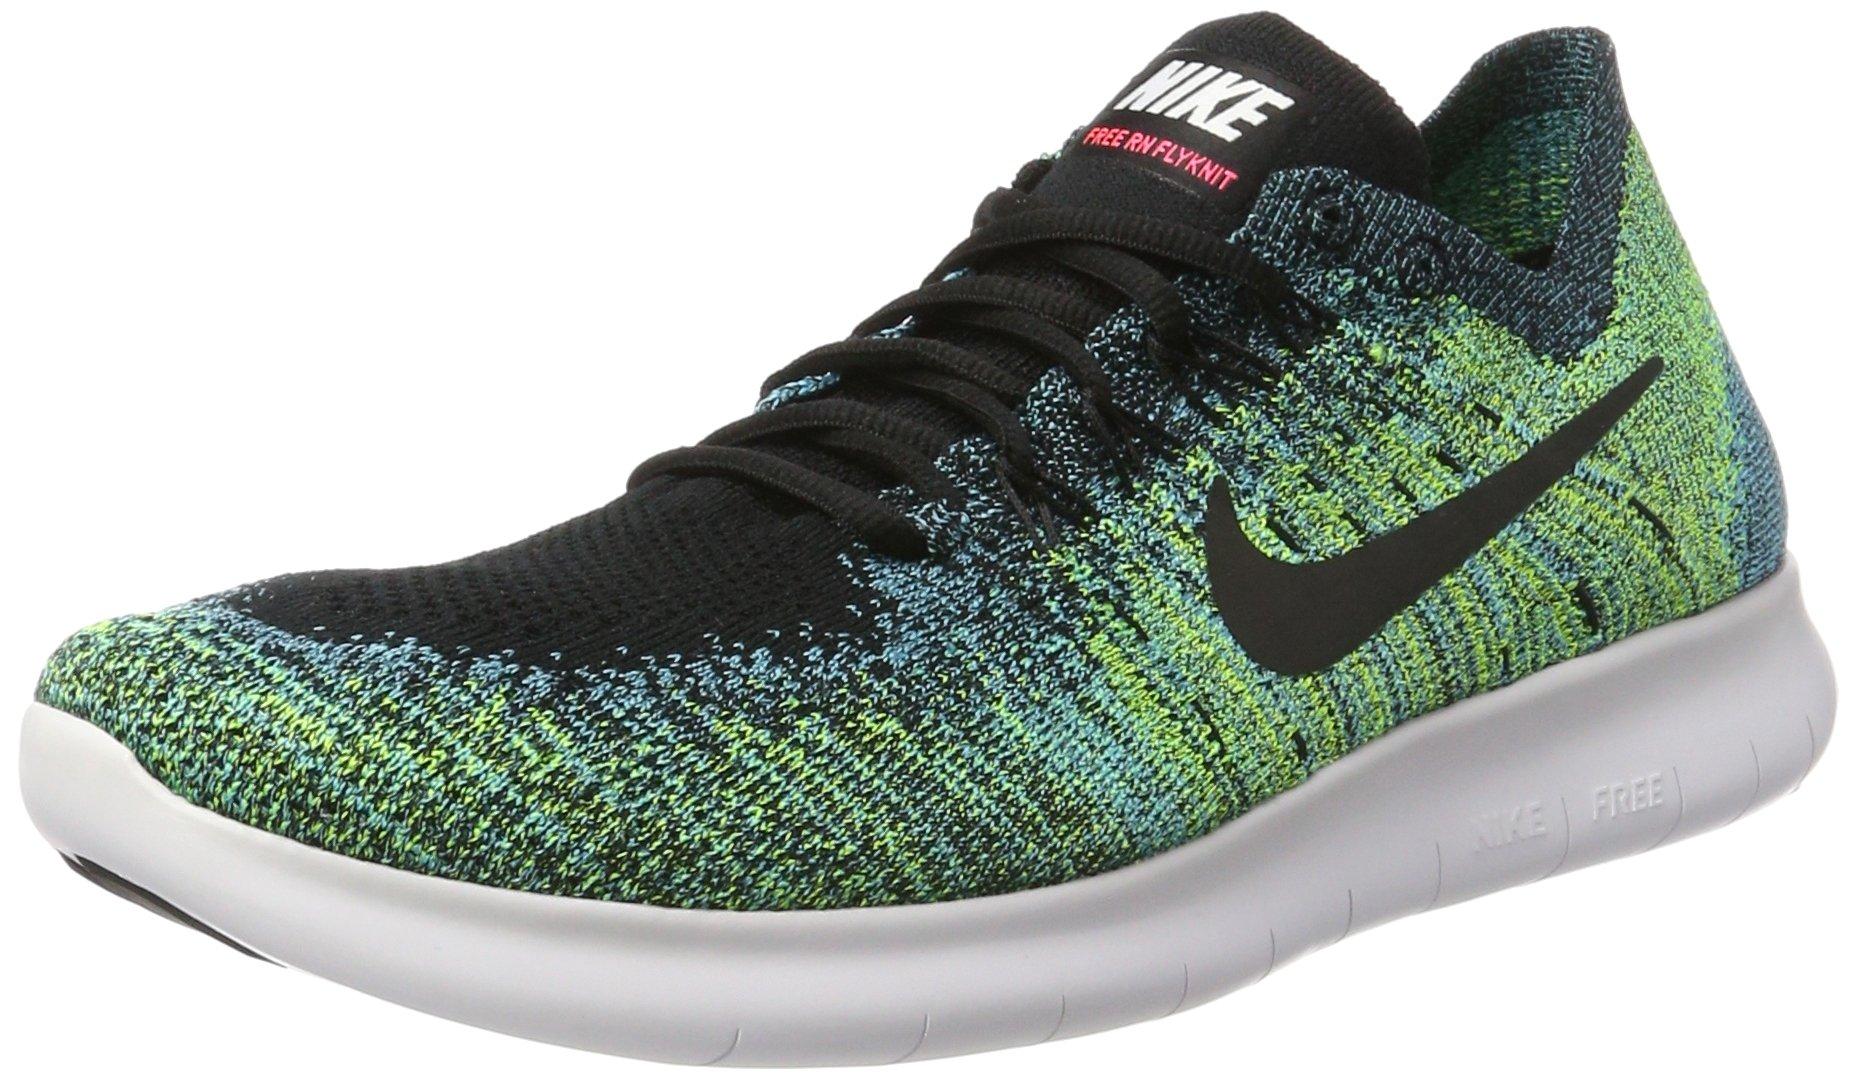 478875cb8f93e Galleon - Nike Men s Free RN Flyknit 2017 Running Shoe  BLACK BLACK-VOLT-CHLORINE BLUE 8.0